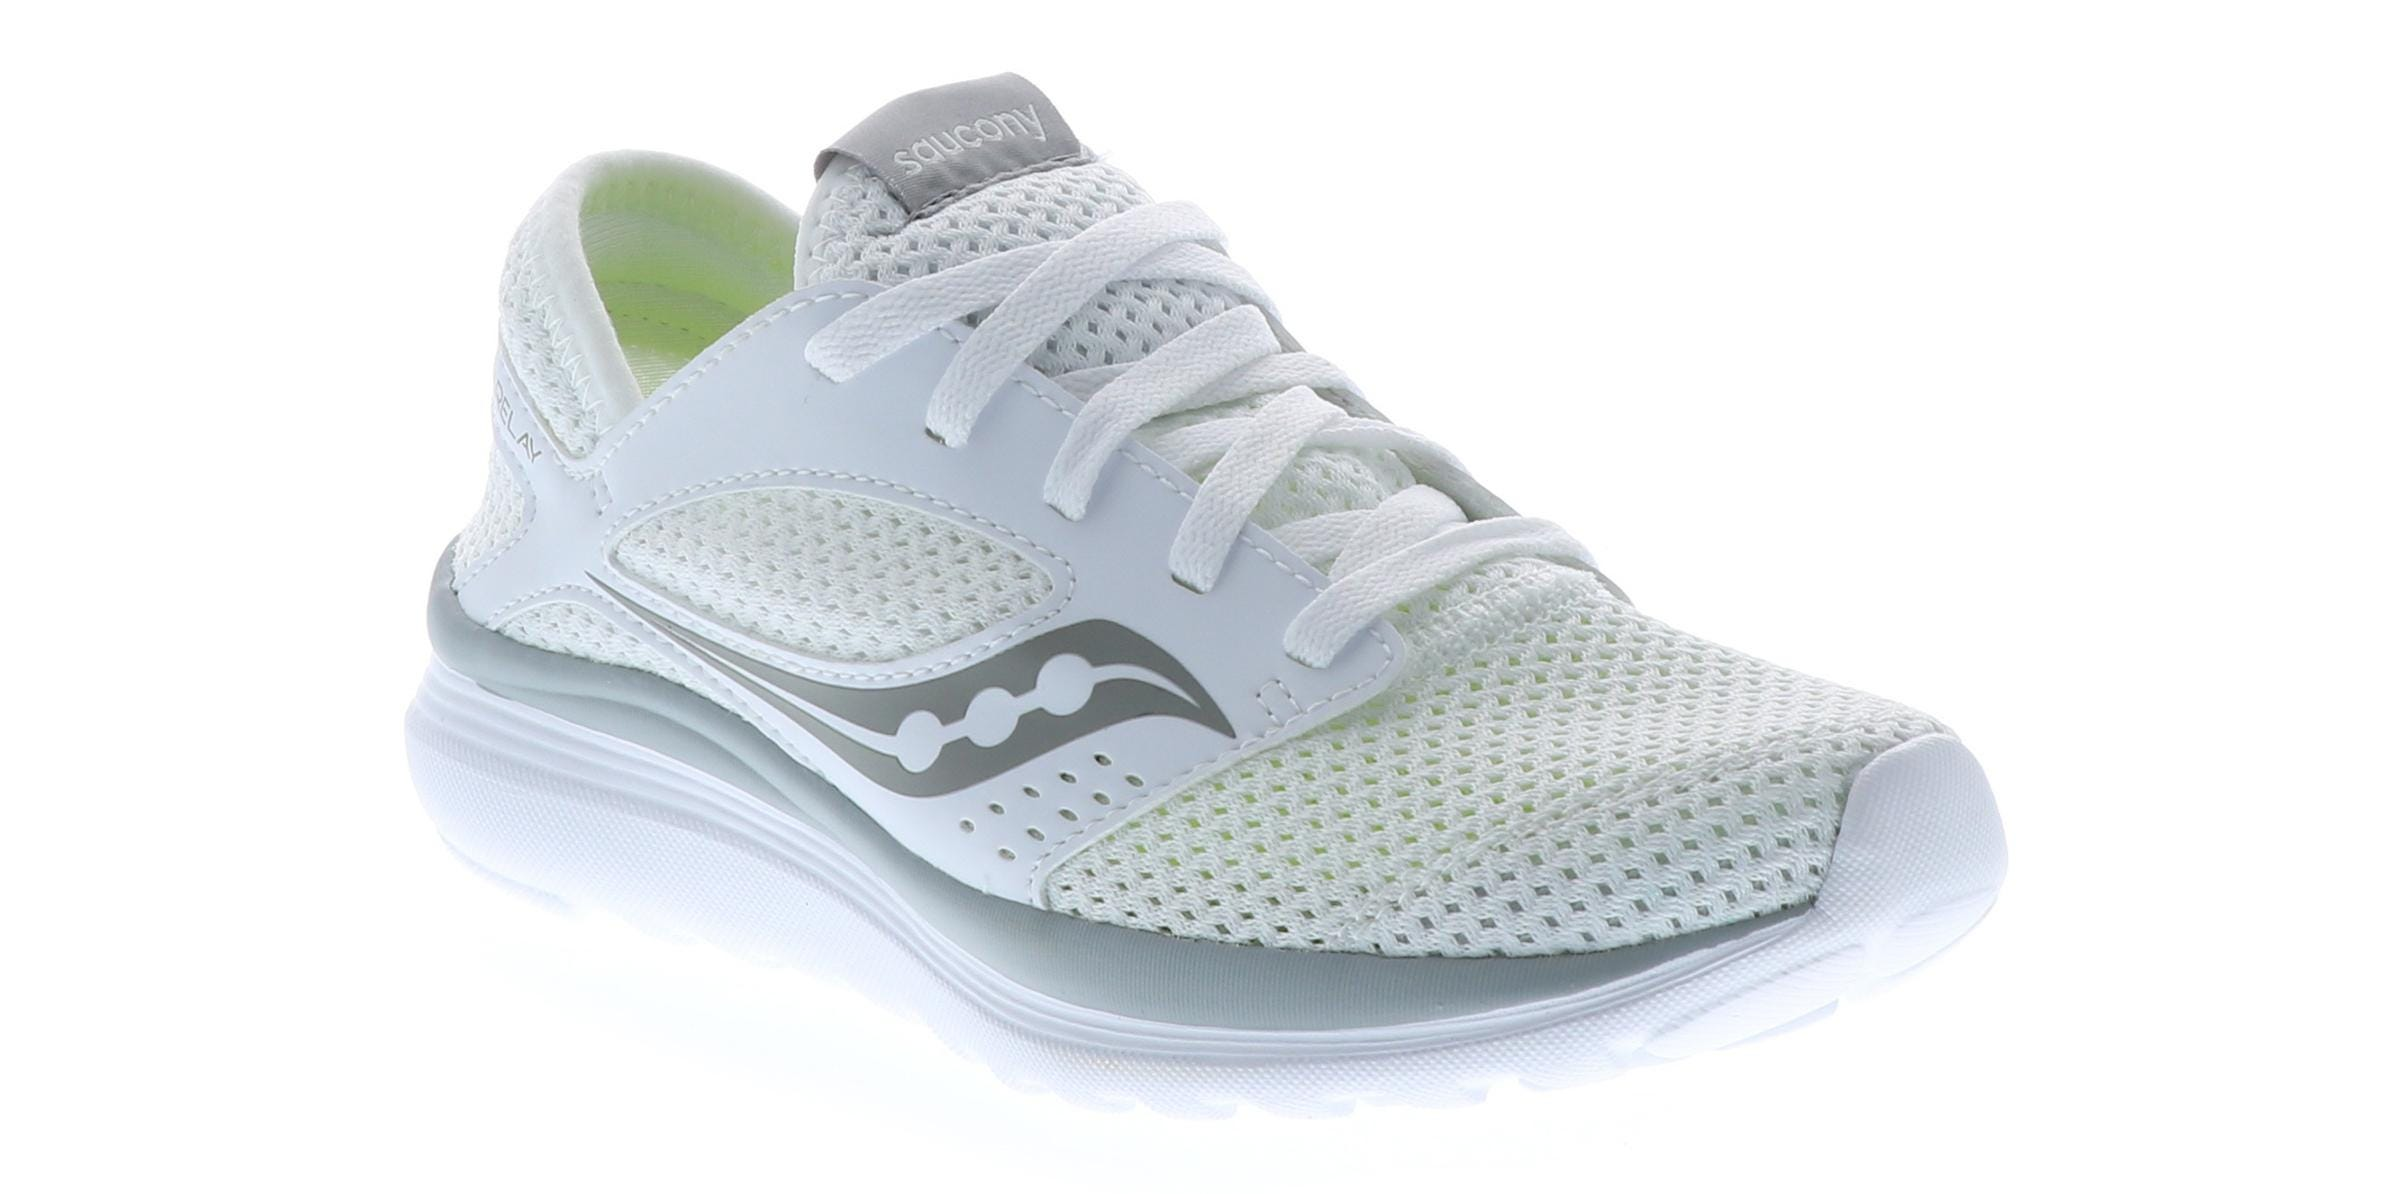 faef985957 SAUCONY Women's Kineta Relay Running Shoes|Shoe Sensation